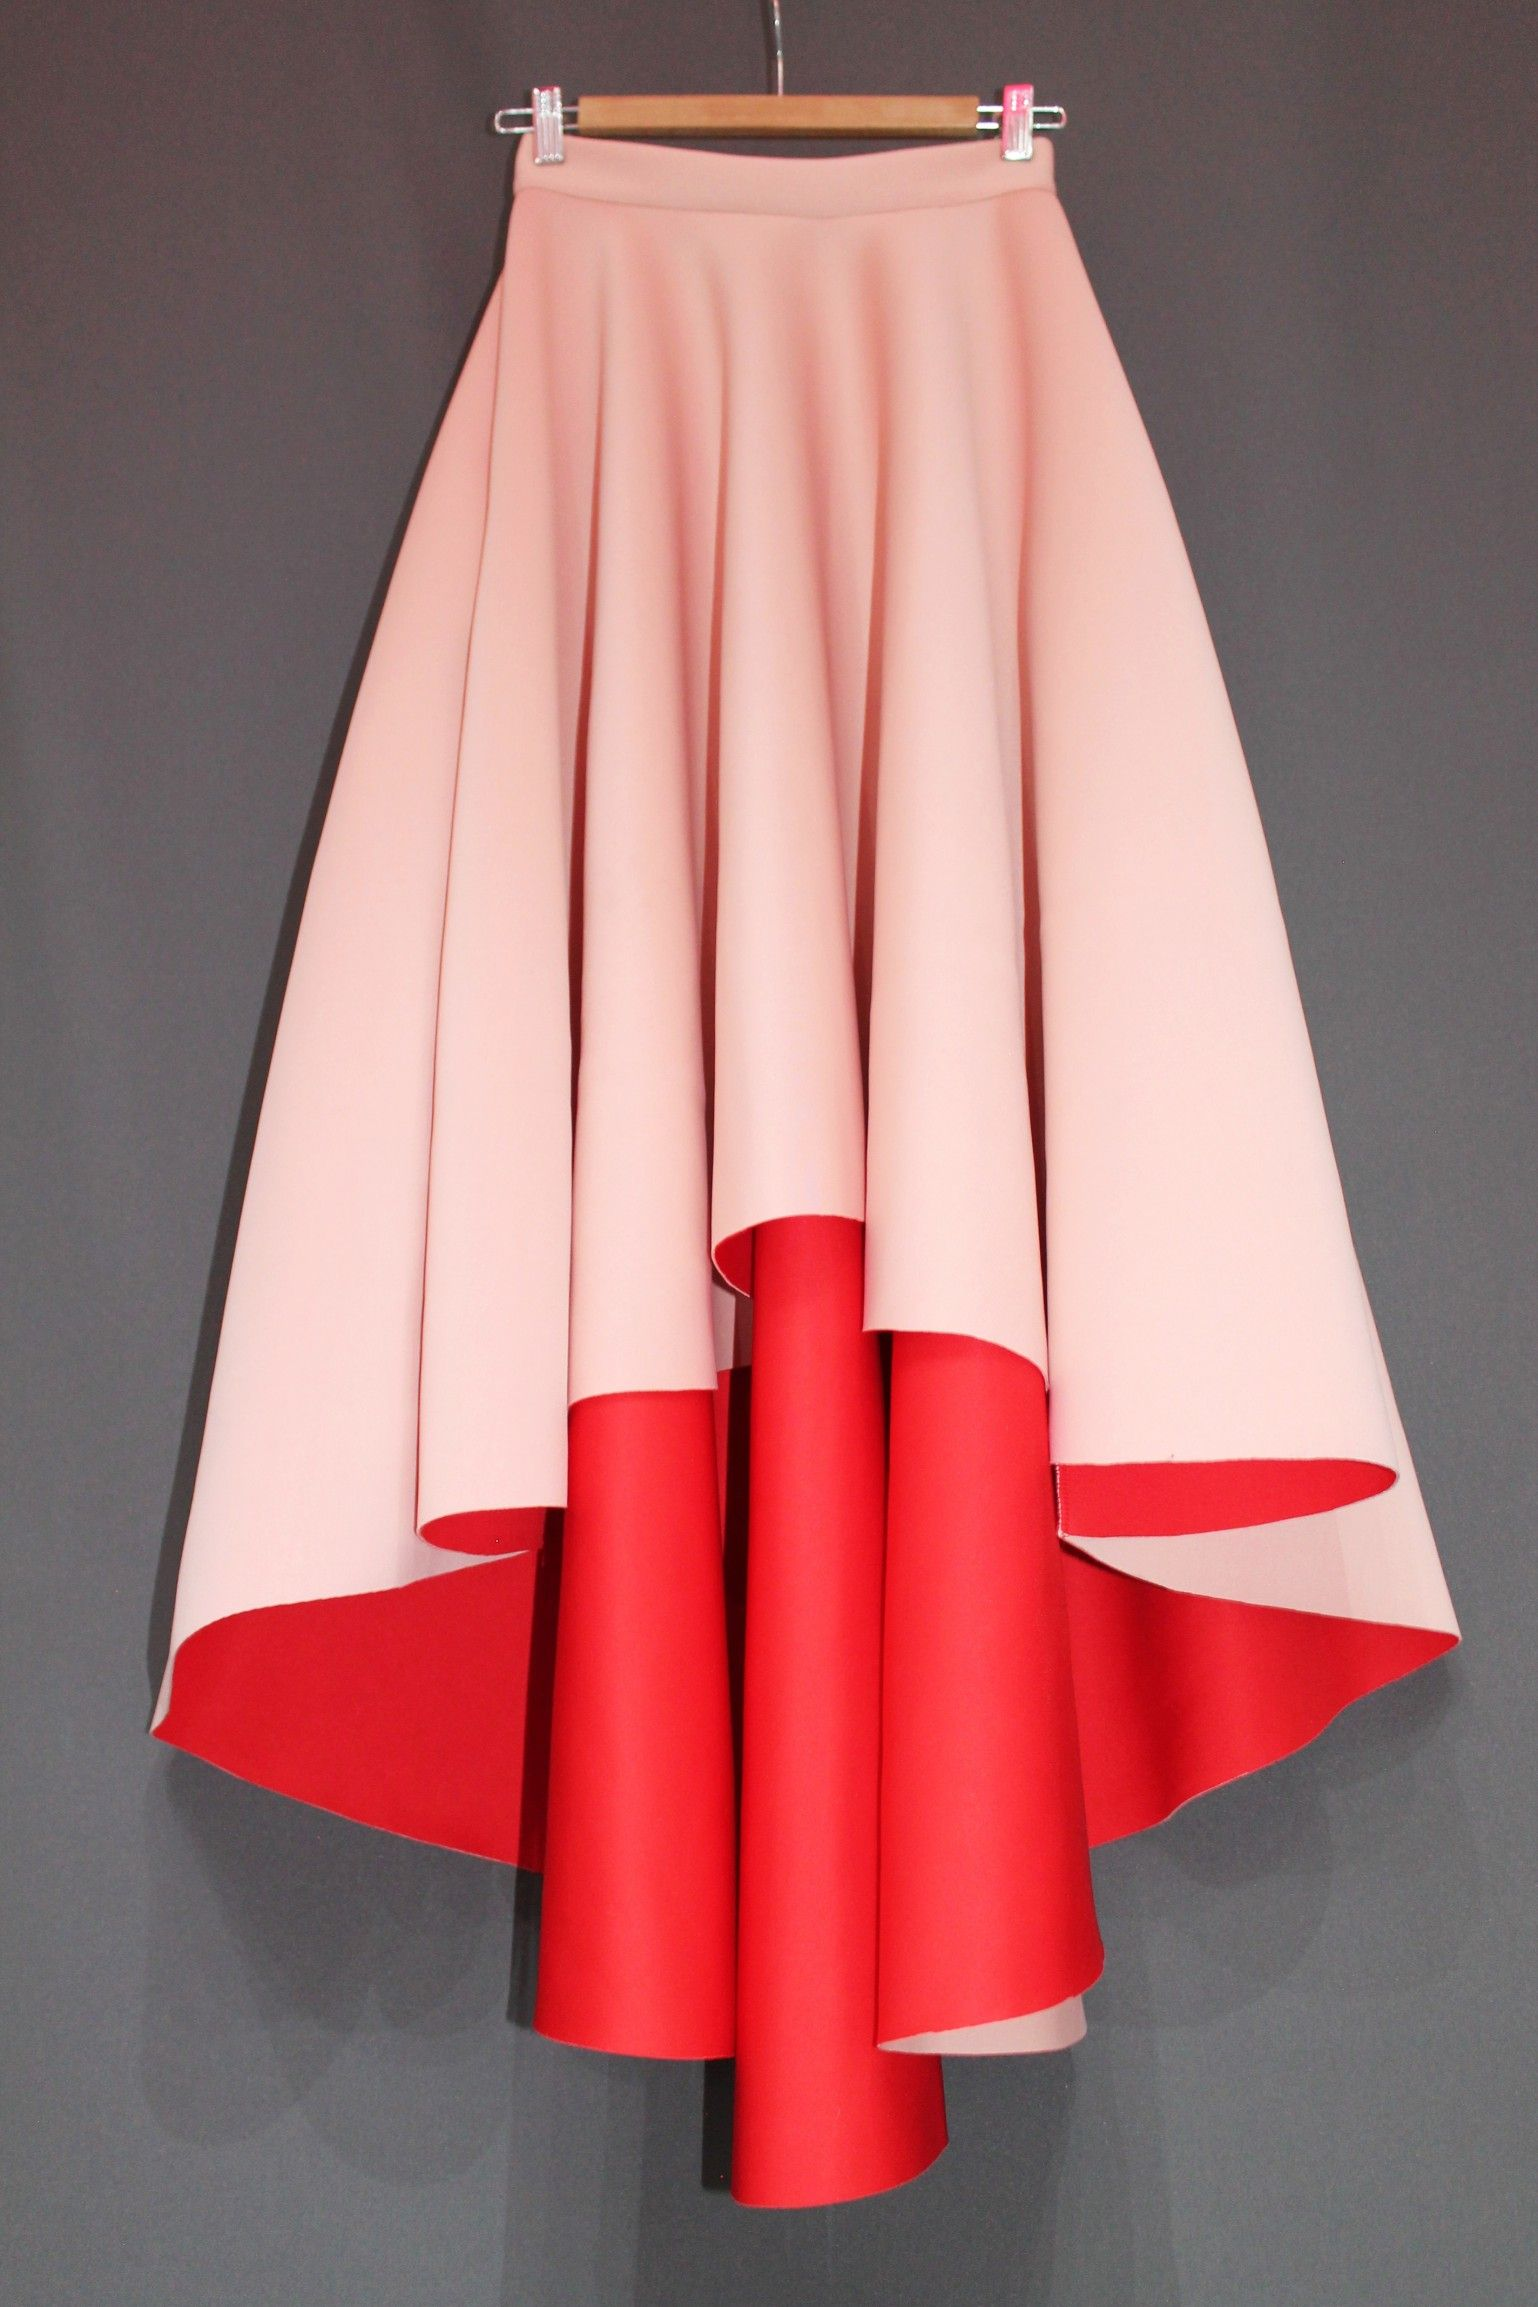 Original Price: <strike>160.00</strike> Scuba Skirt made of Neoprene ...